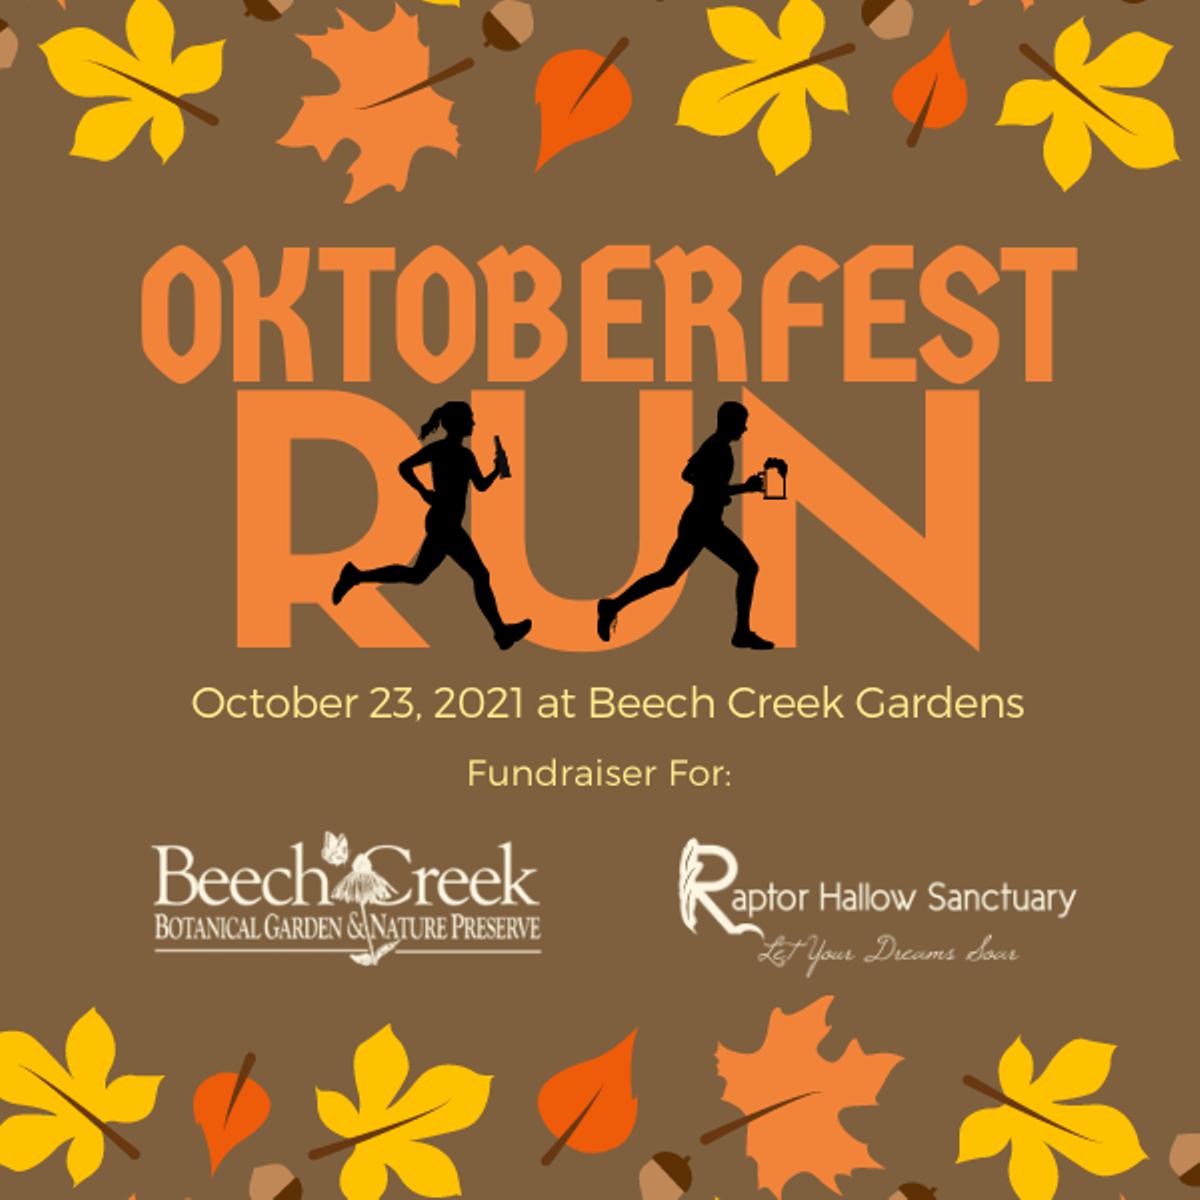 oktoberfest_run_2021_graphic_square_600_x_600_px_.png